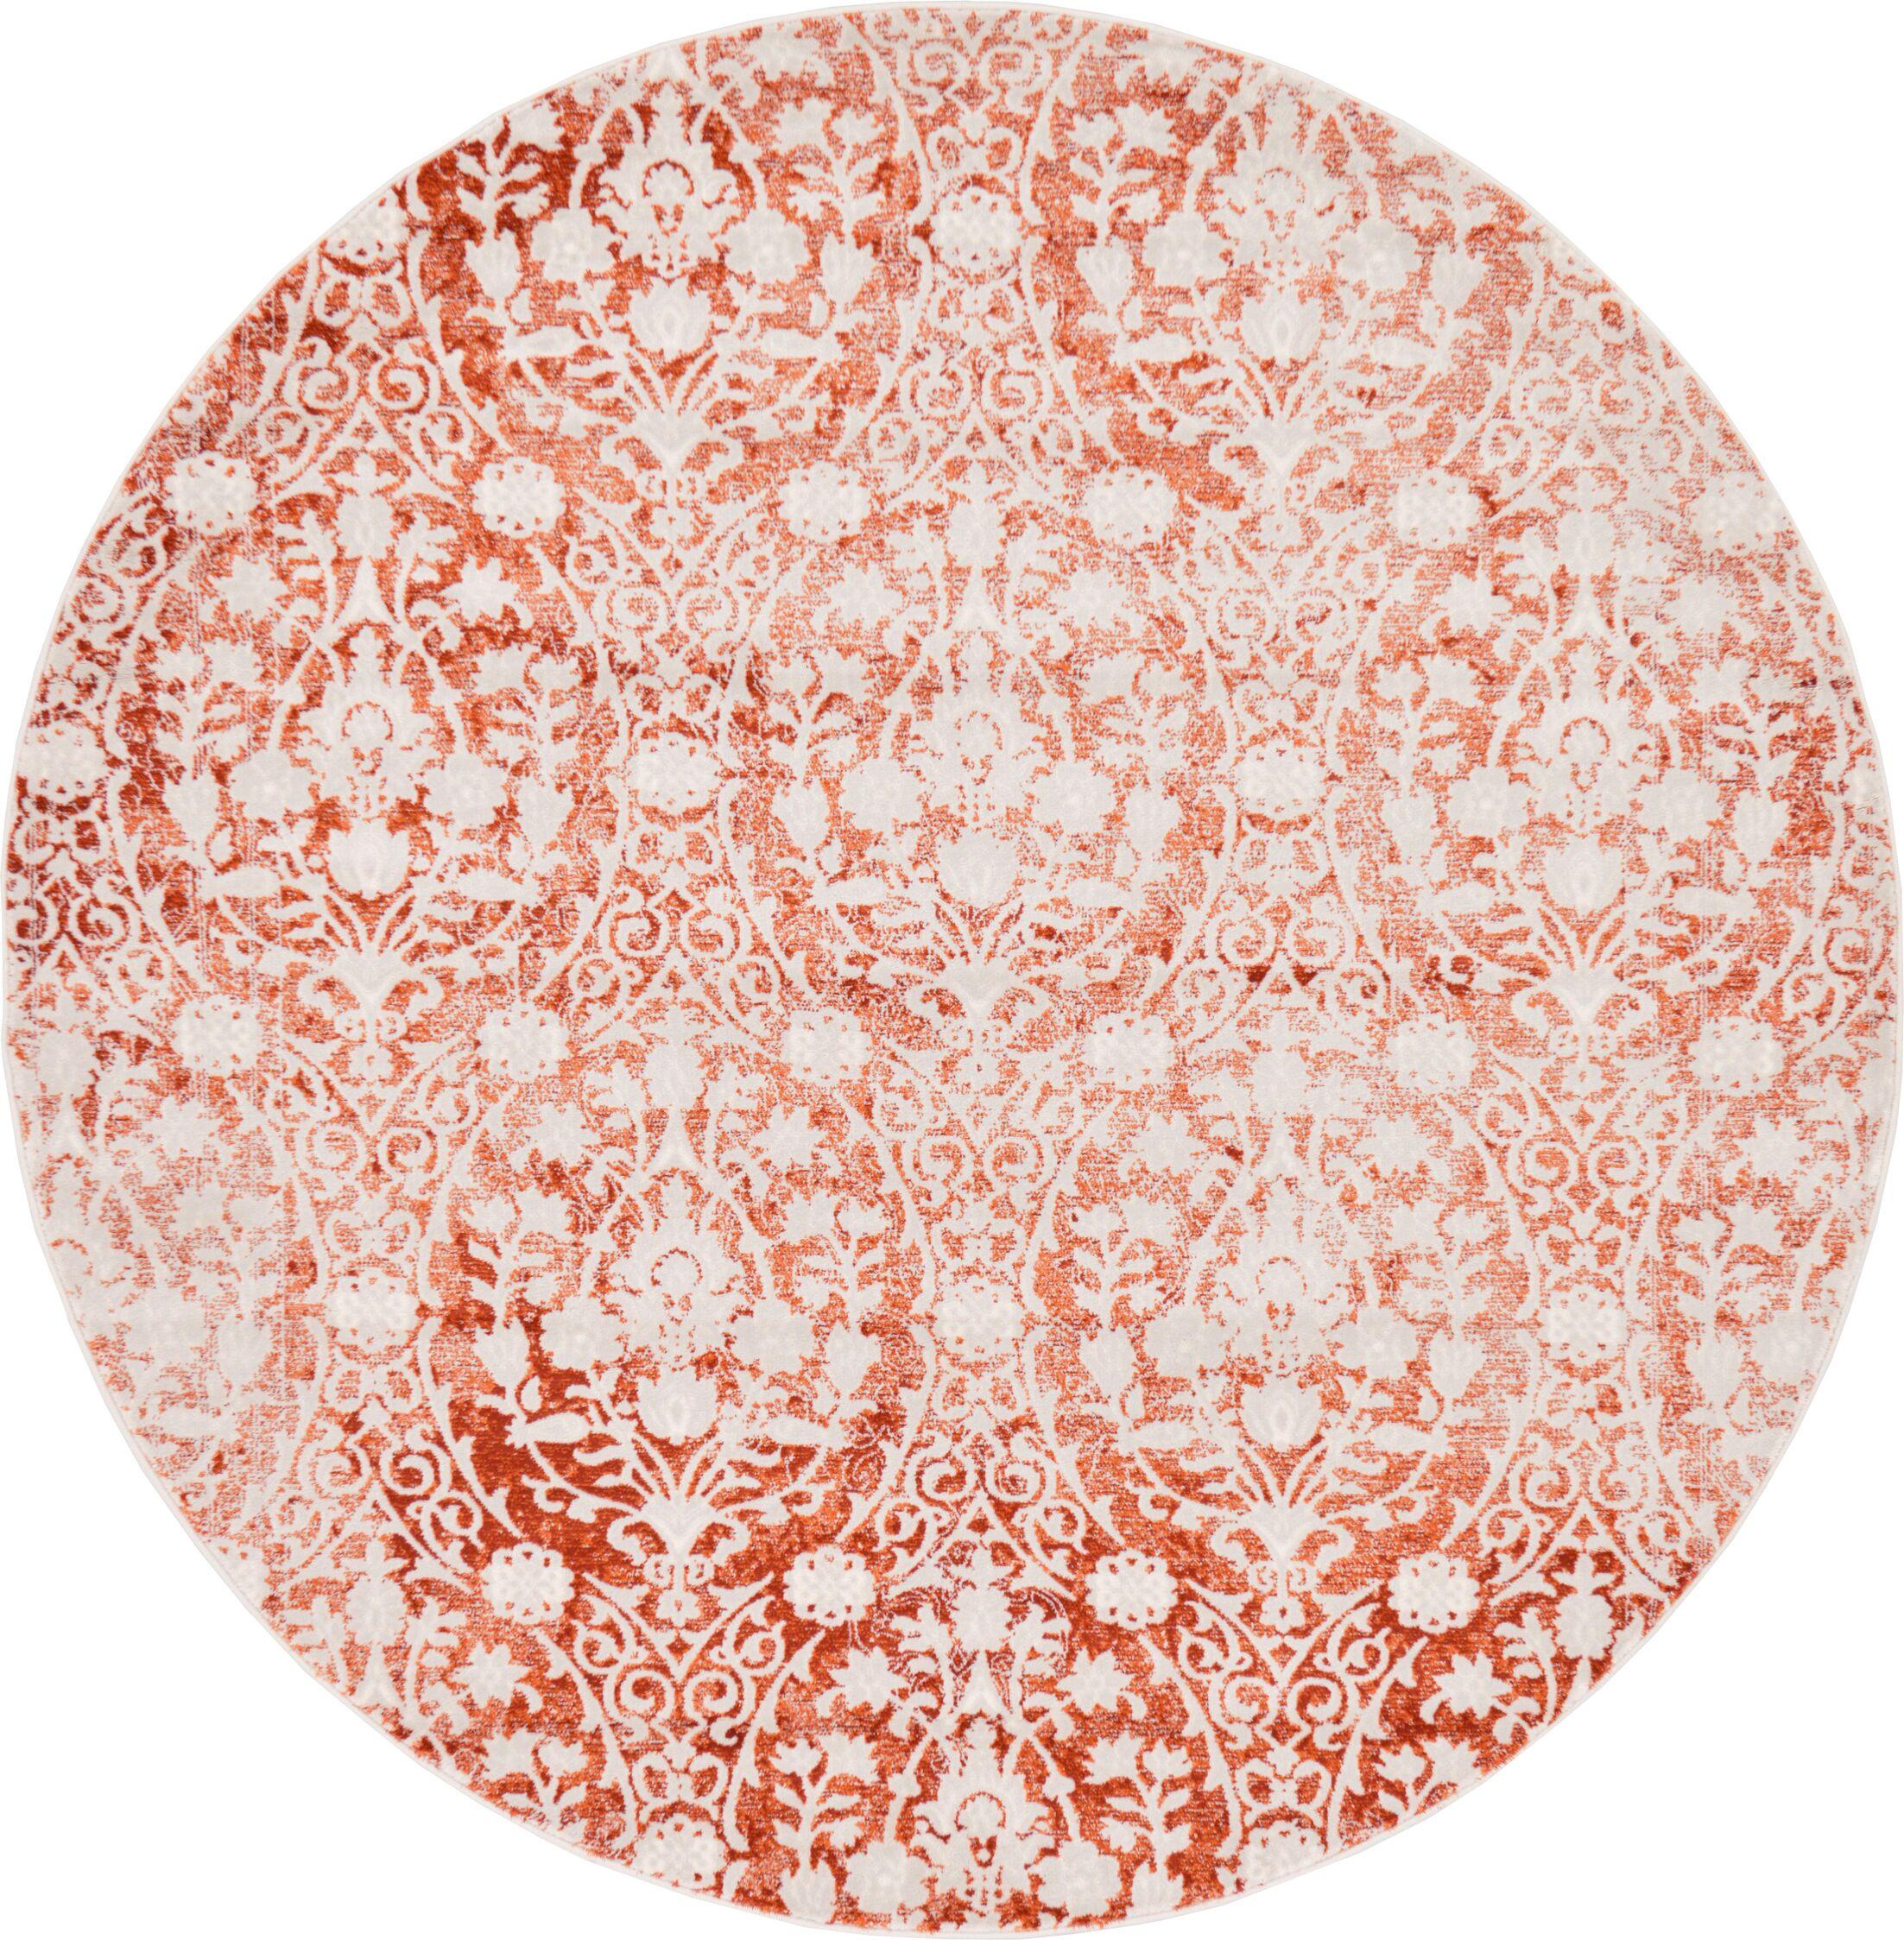 Patenaude Terracotta Area Rug Rug Size: Round 6'